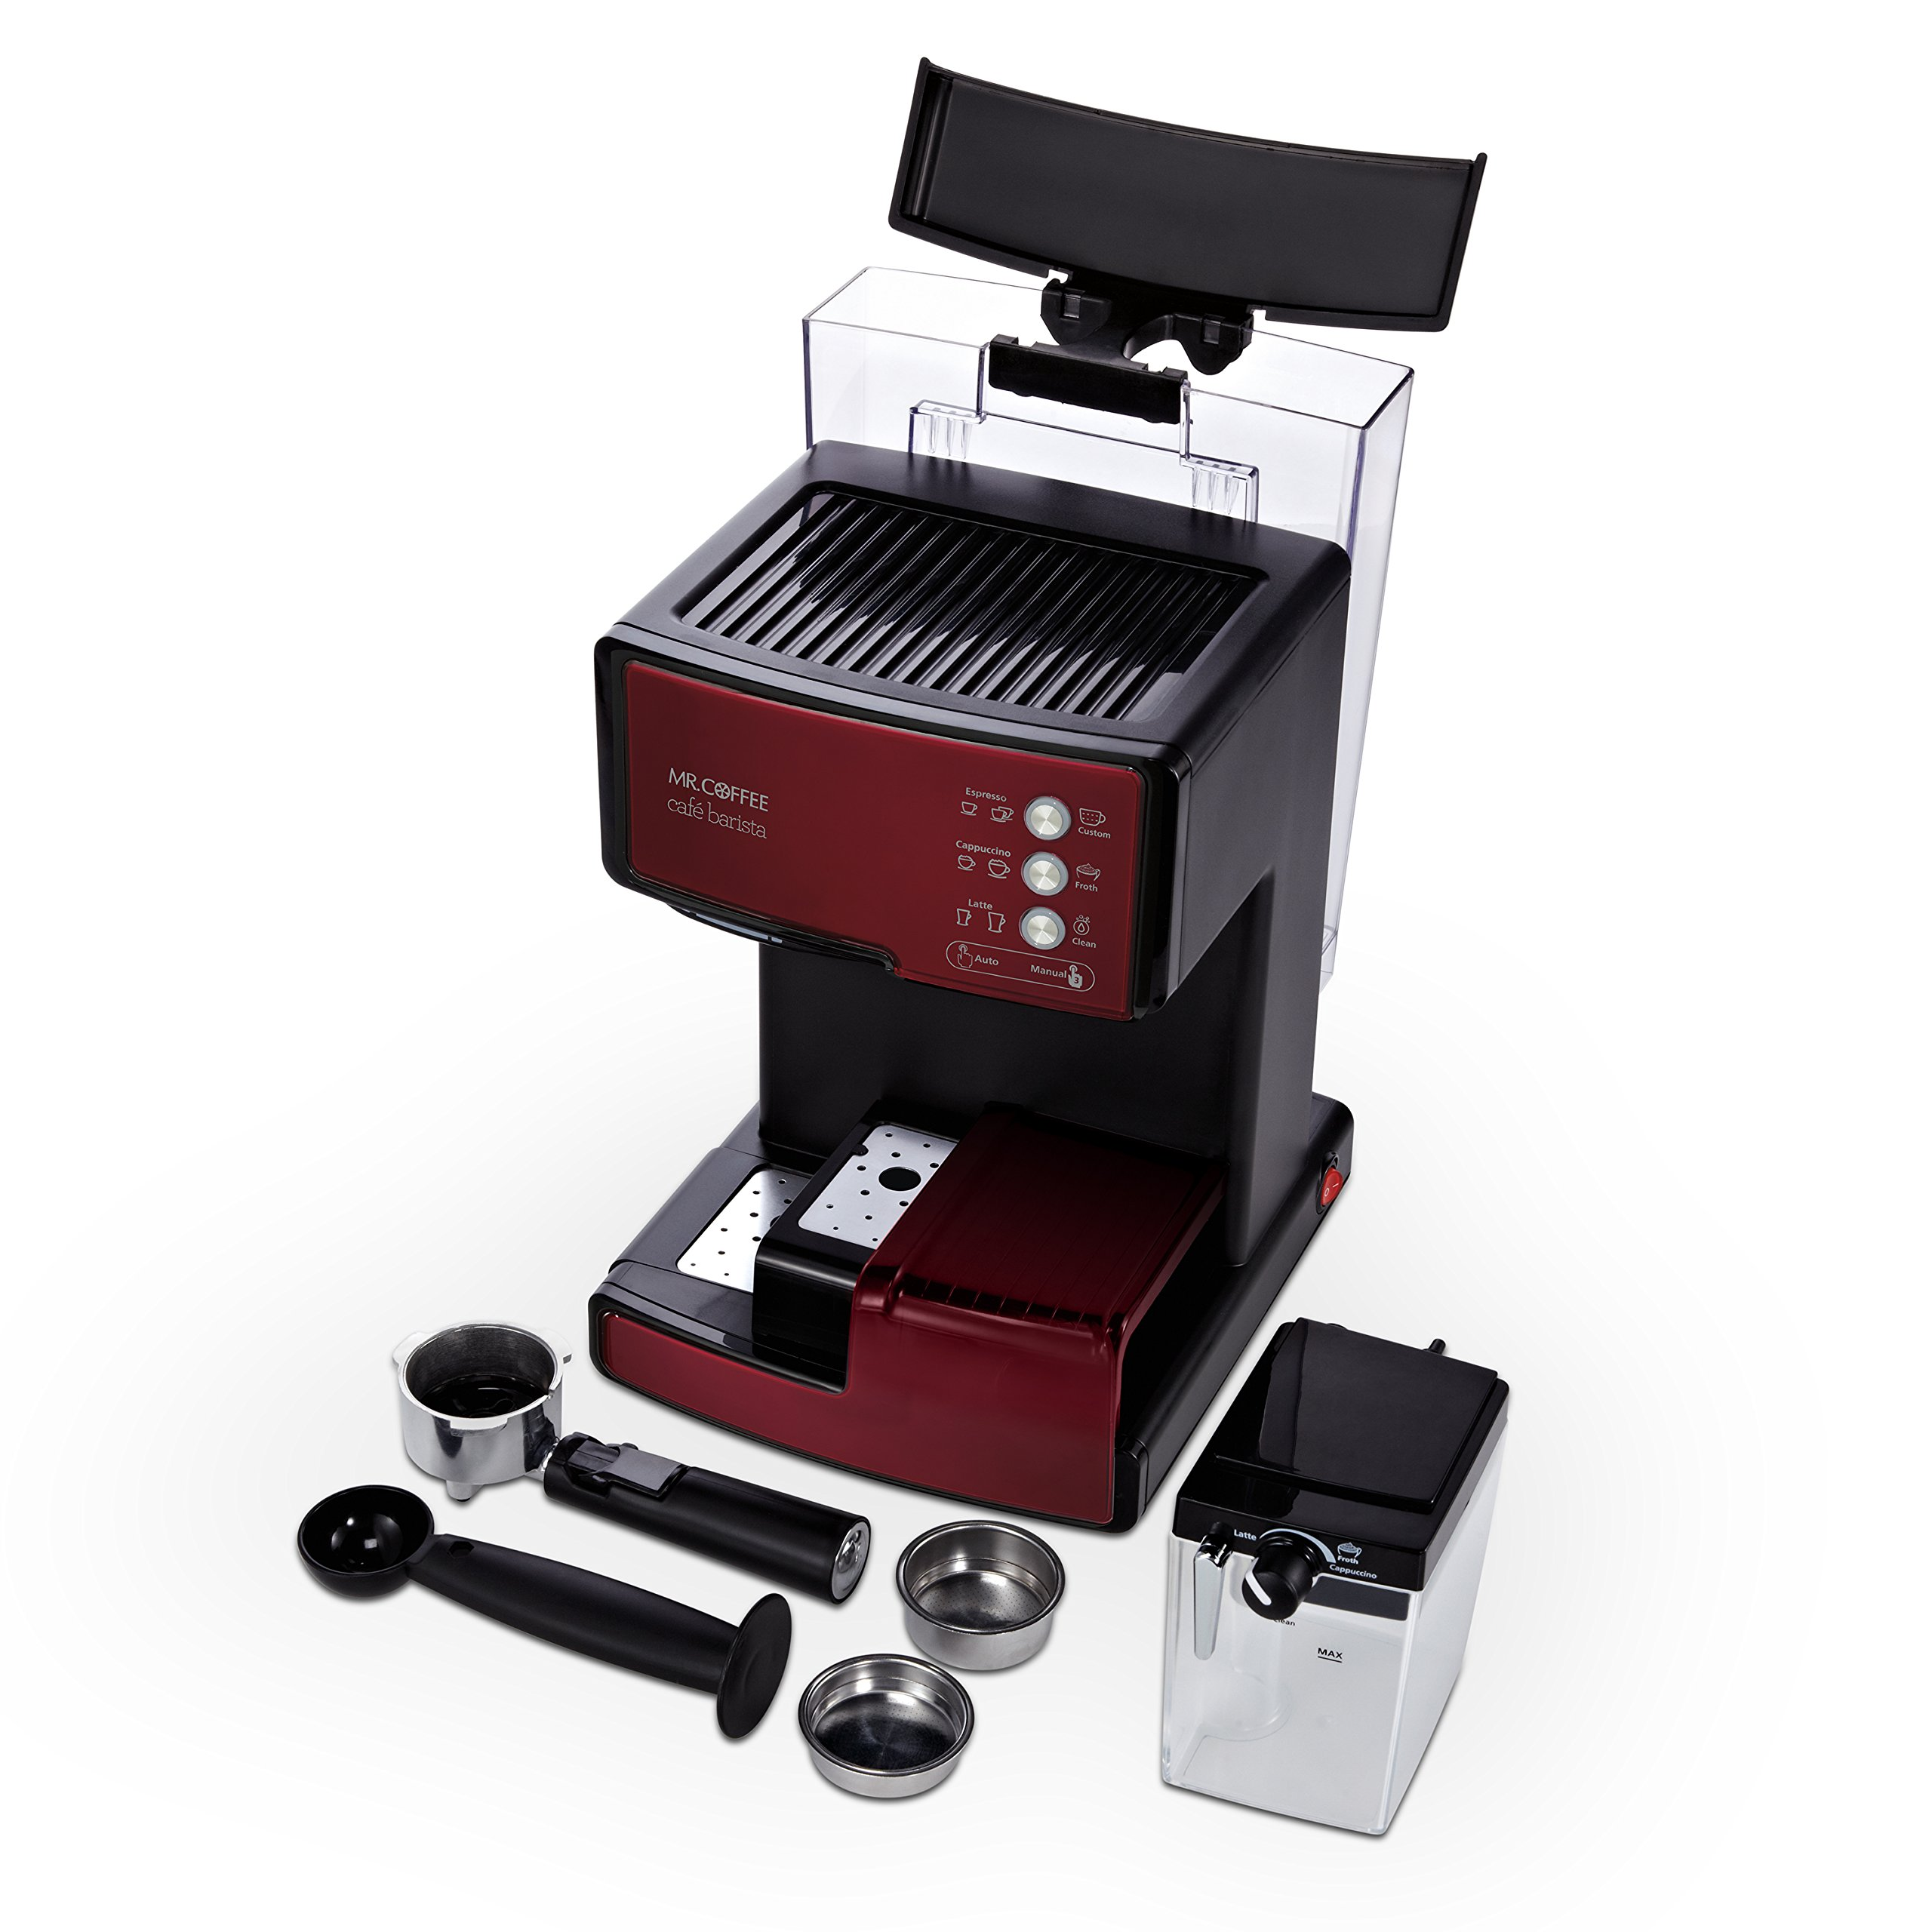 Mr. Coffee Cafe Barista Espresso and Cappuccino Maker, Red - BVMC-ECMP1106 by Mr. Coffee (Image #2)